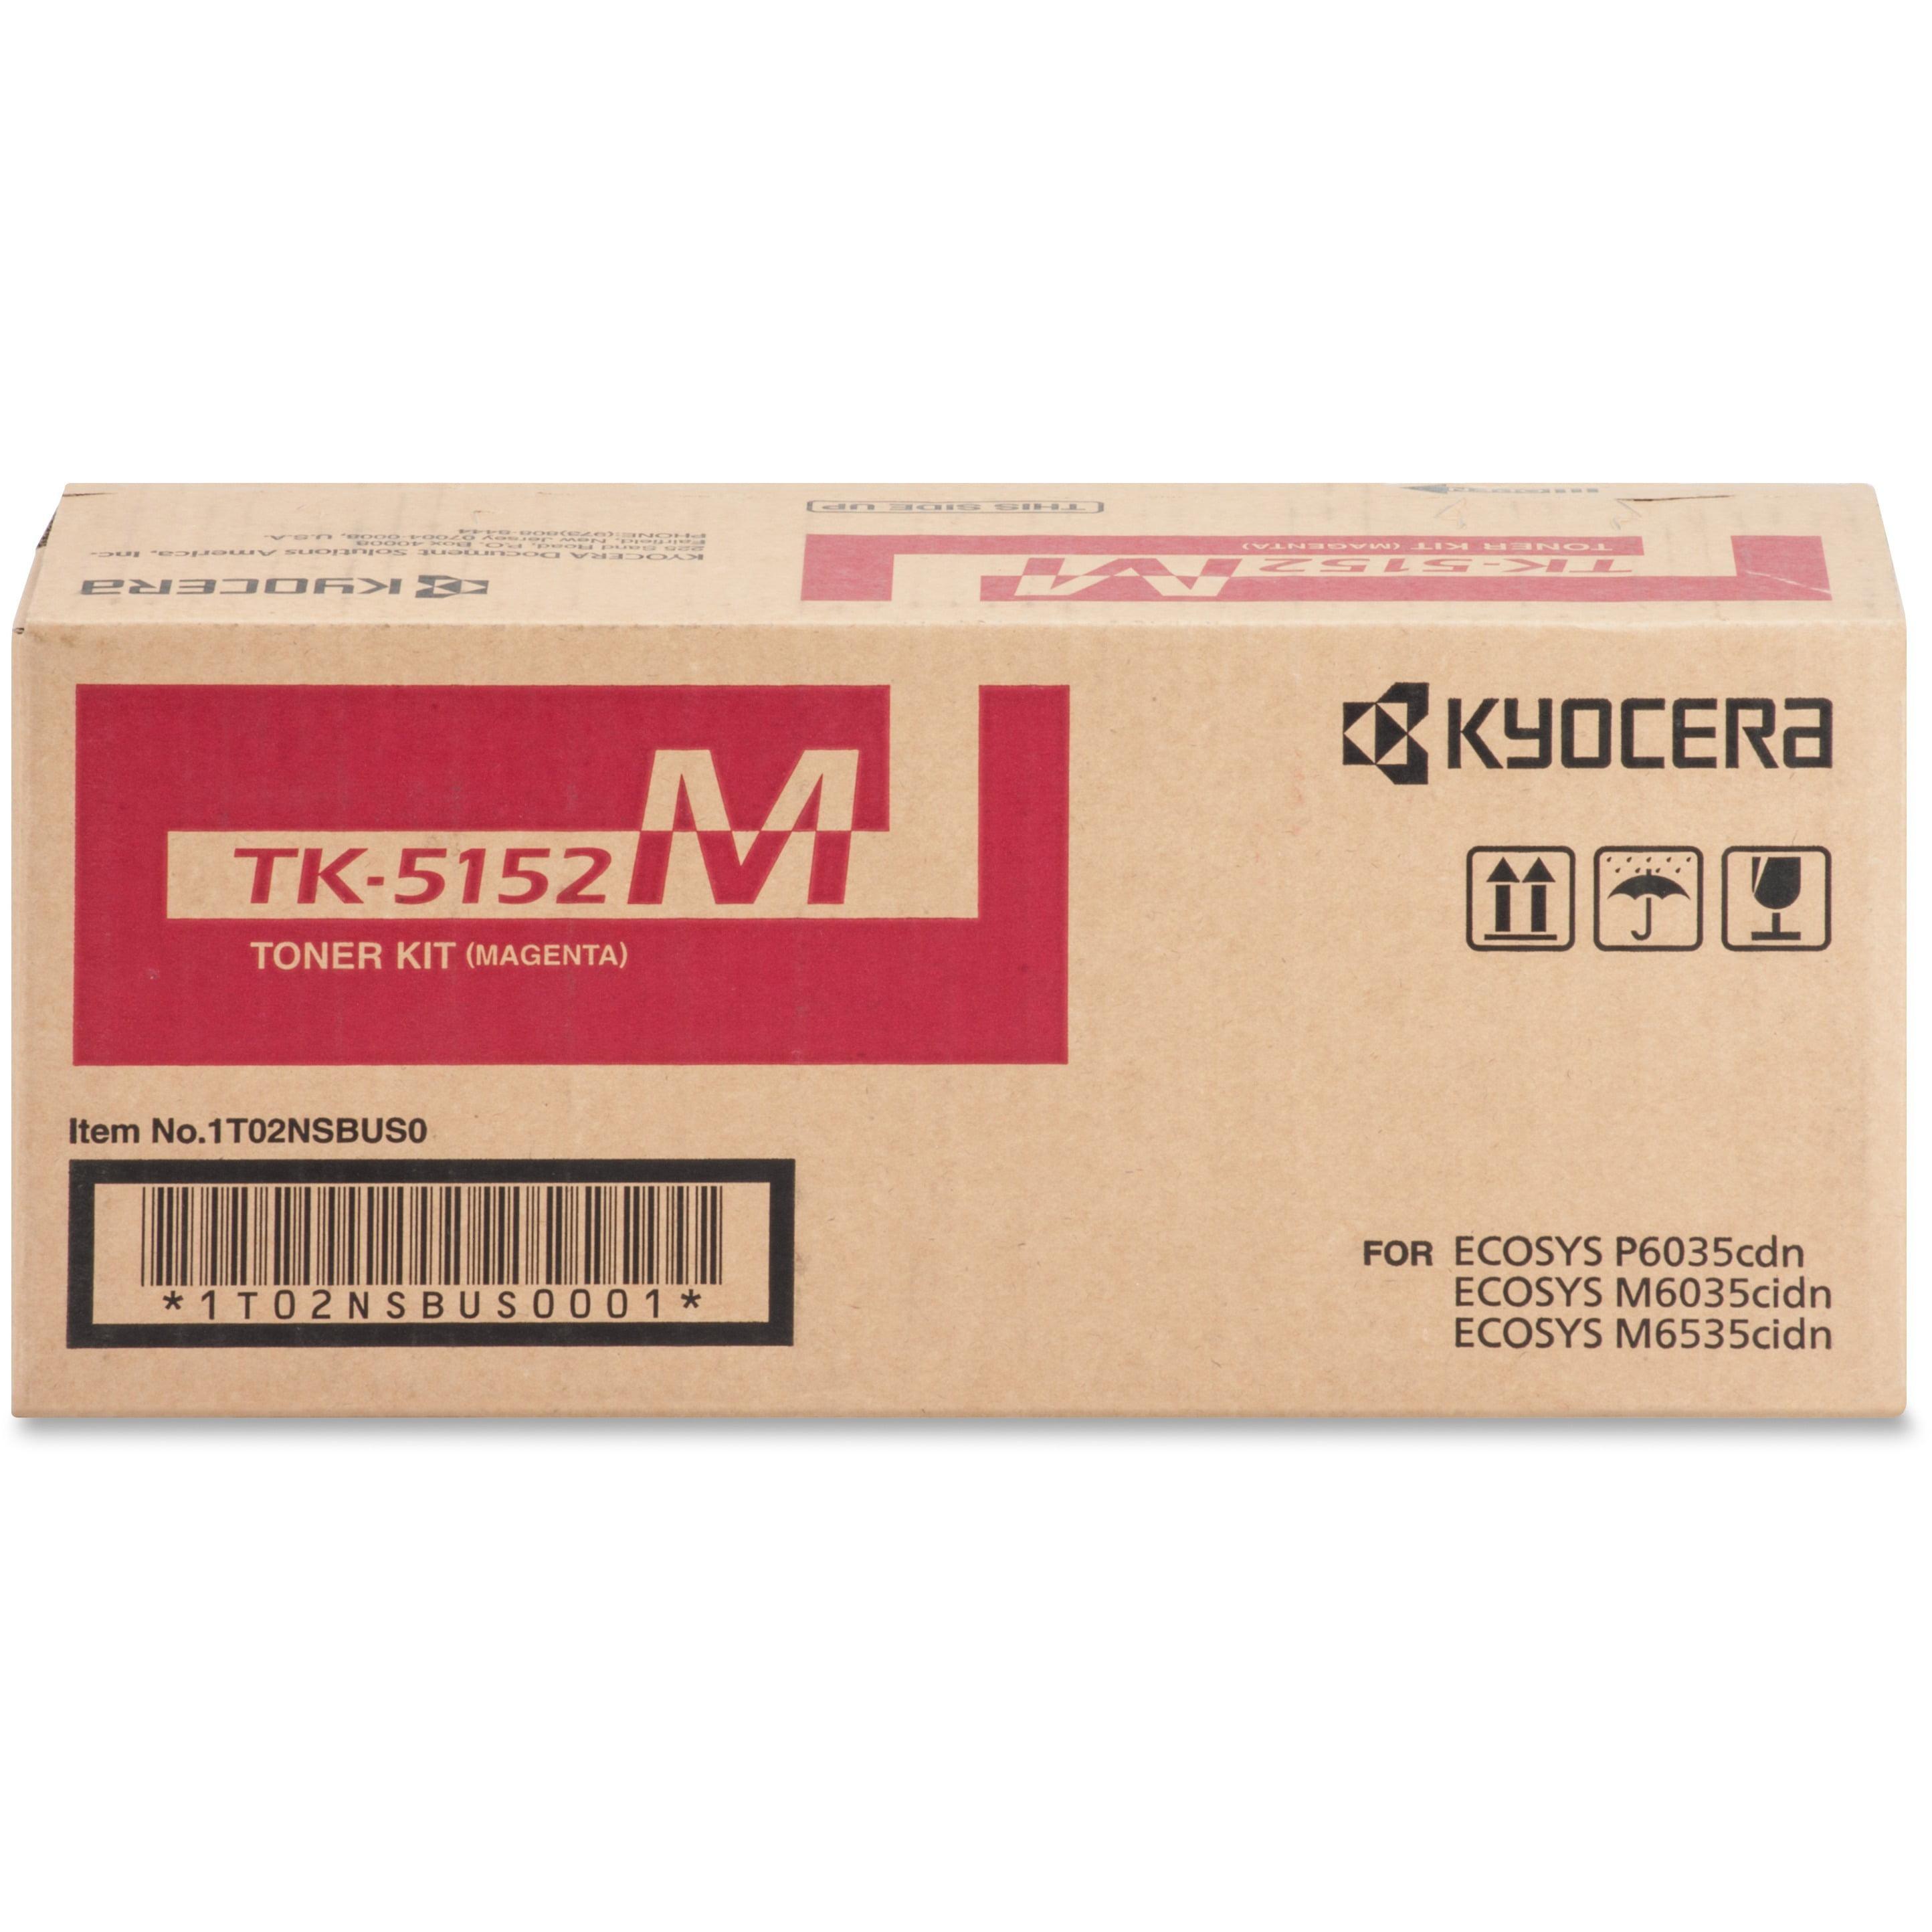 Kyocera, KYOTK5152M, TK-5152 Toner Cartridge, 1 Each